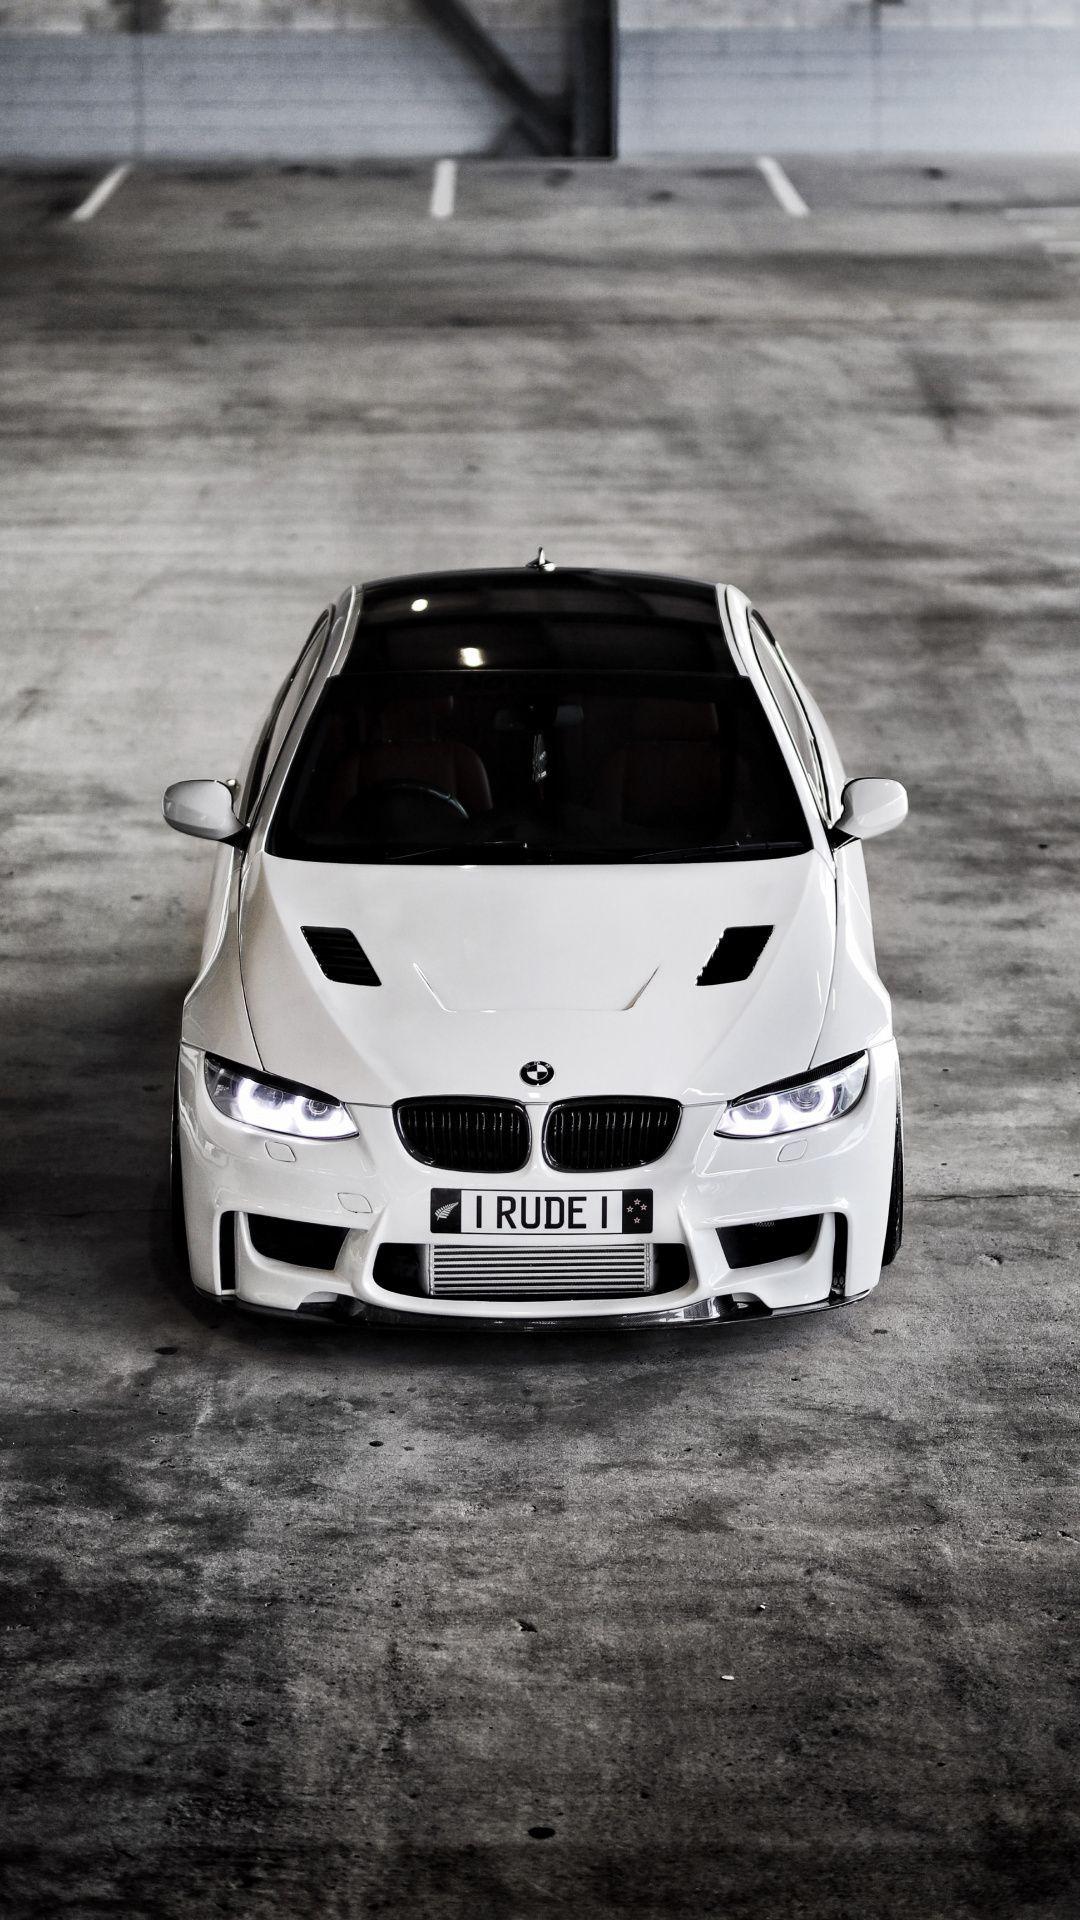 1080x1920 White Bmw Car Luxurious Car Wallpaper In 2020 Bmw Car Bmw Car Wallpapers